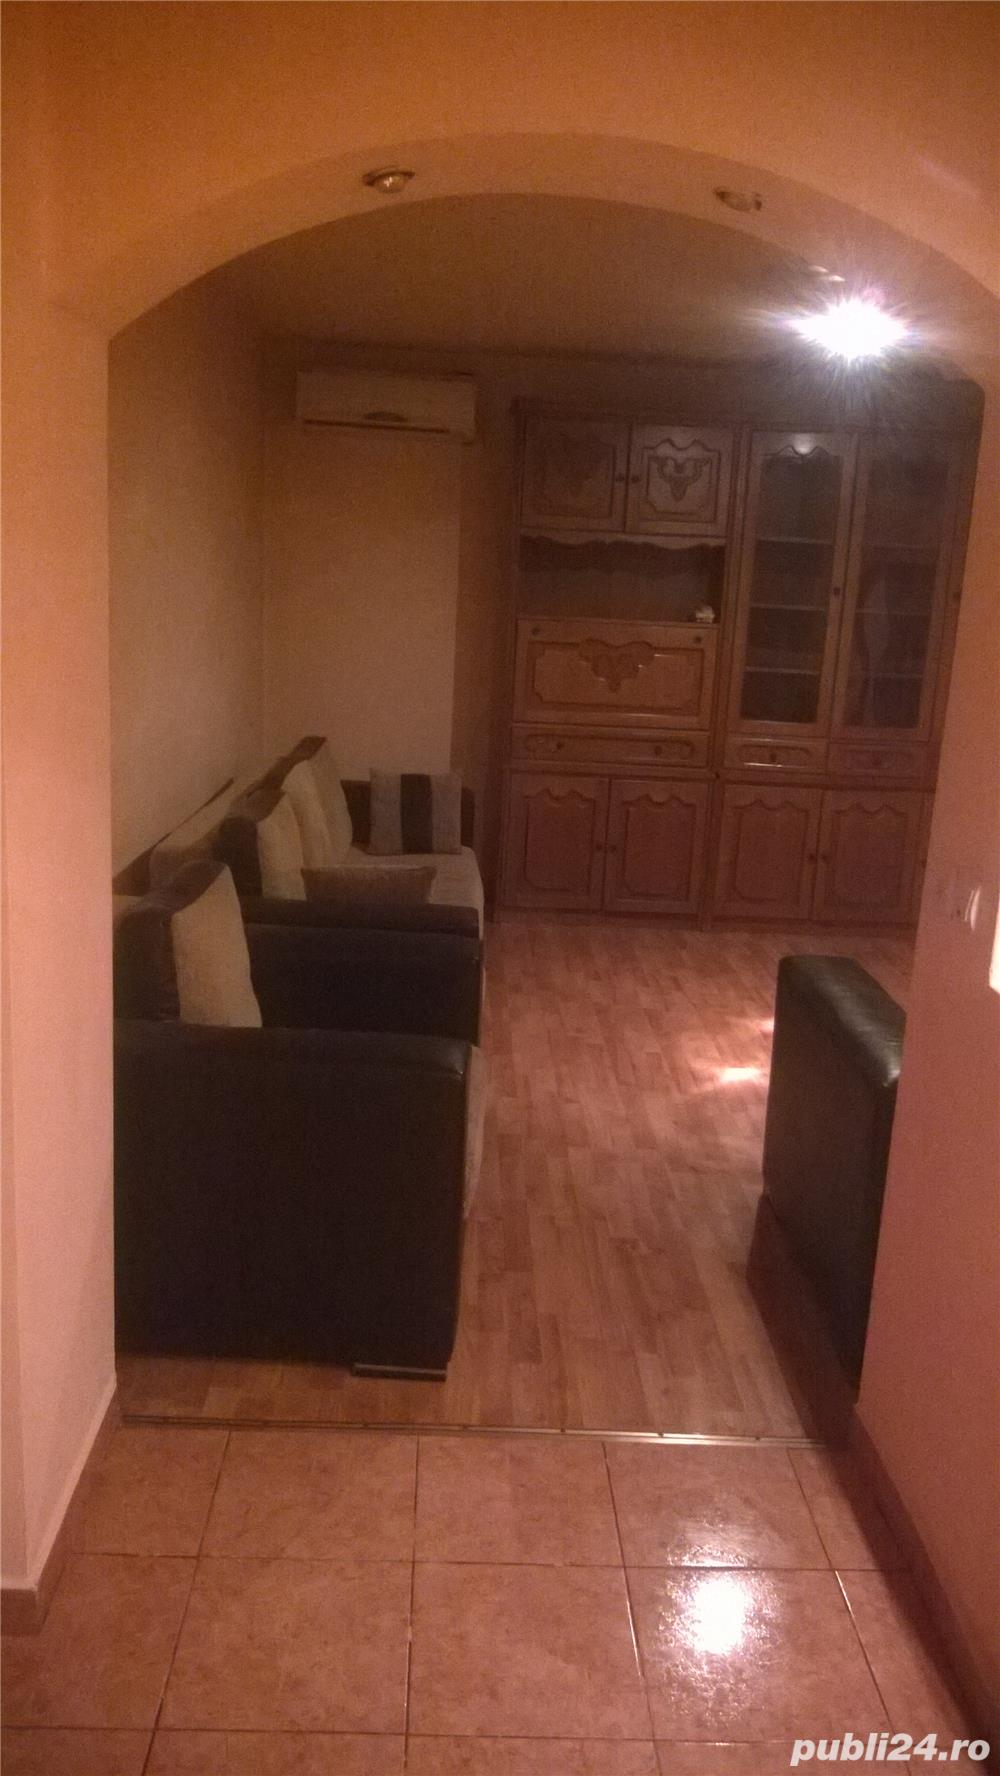 Apartament 3 camere la pret de 2, centrala proprie, G Enescu Craiova